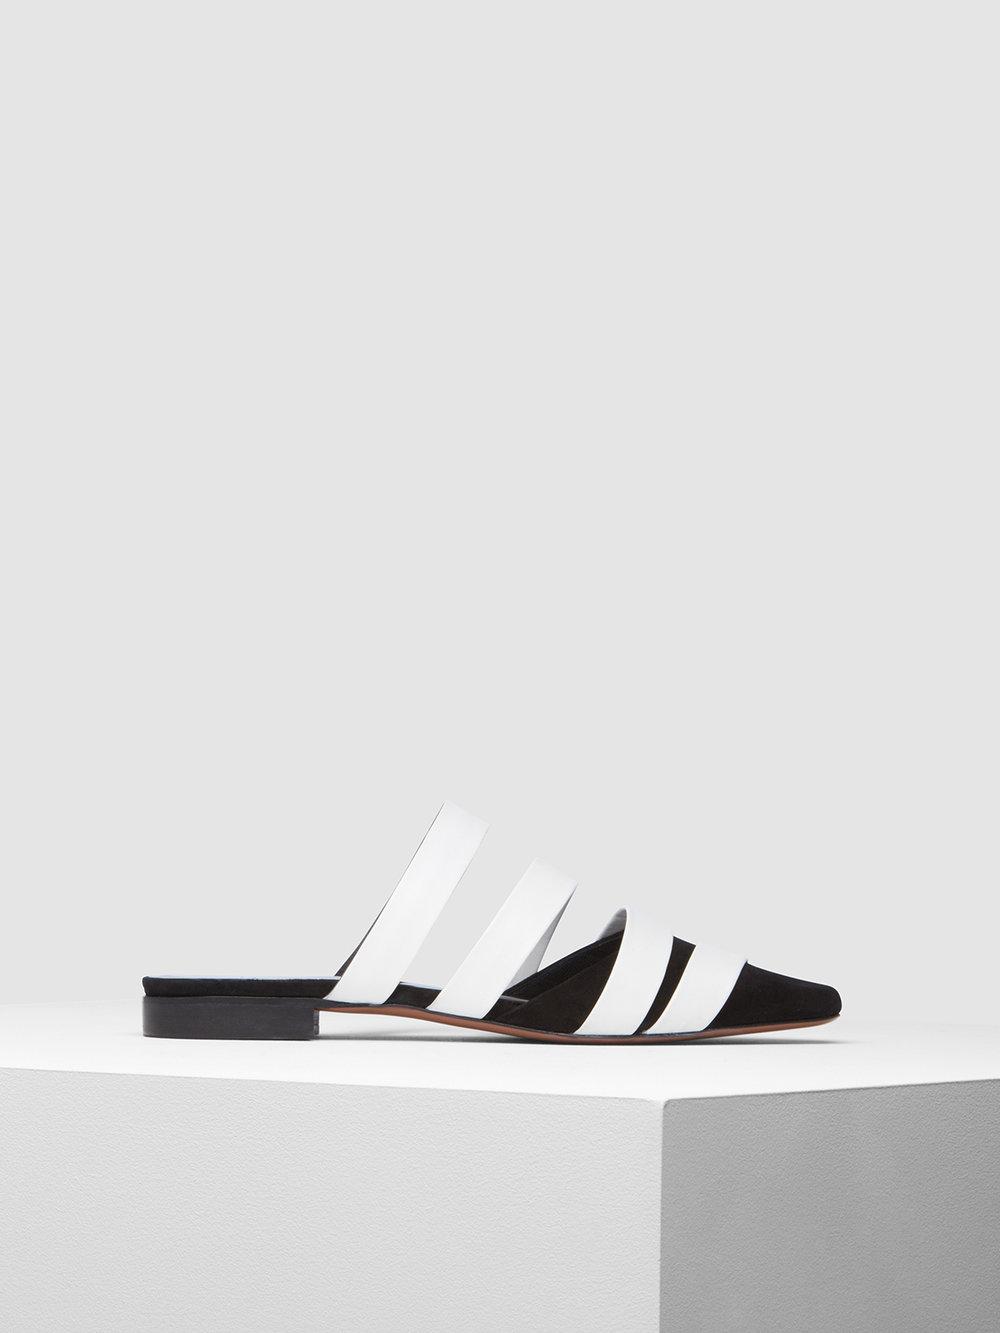 Gomesa white black side.jpg